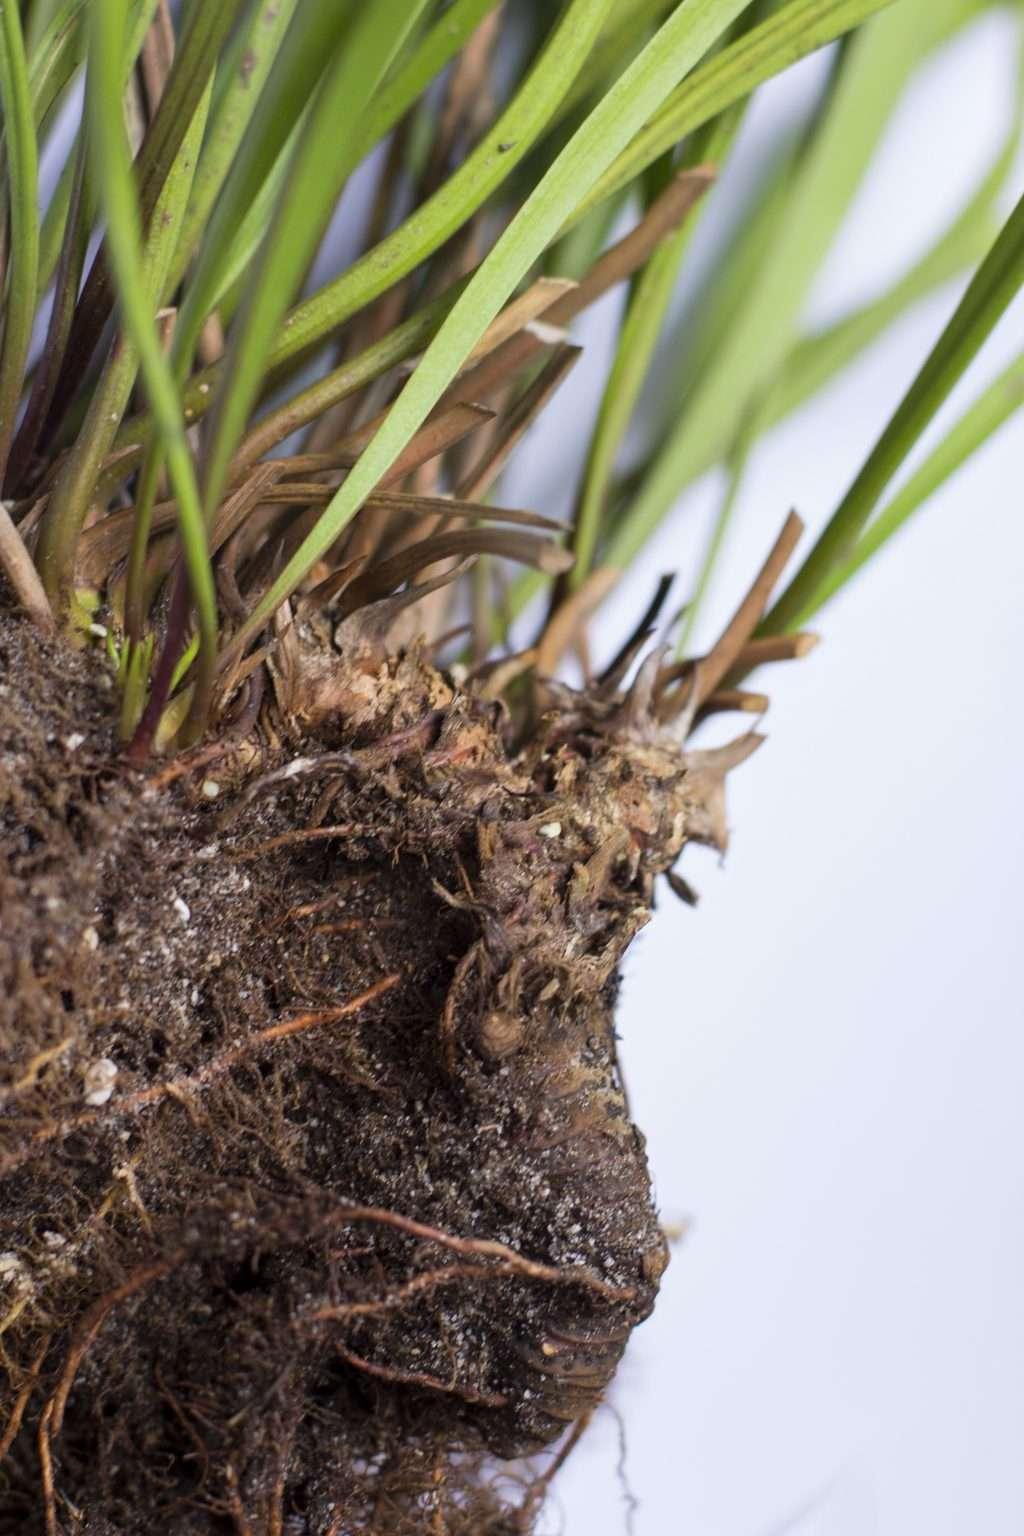 Woody Sarracenia rhizome